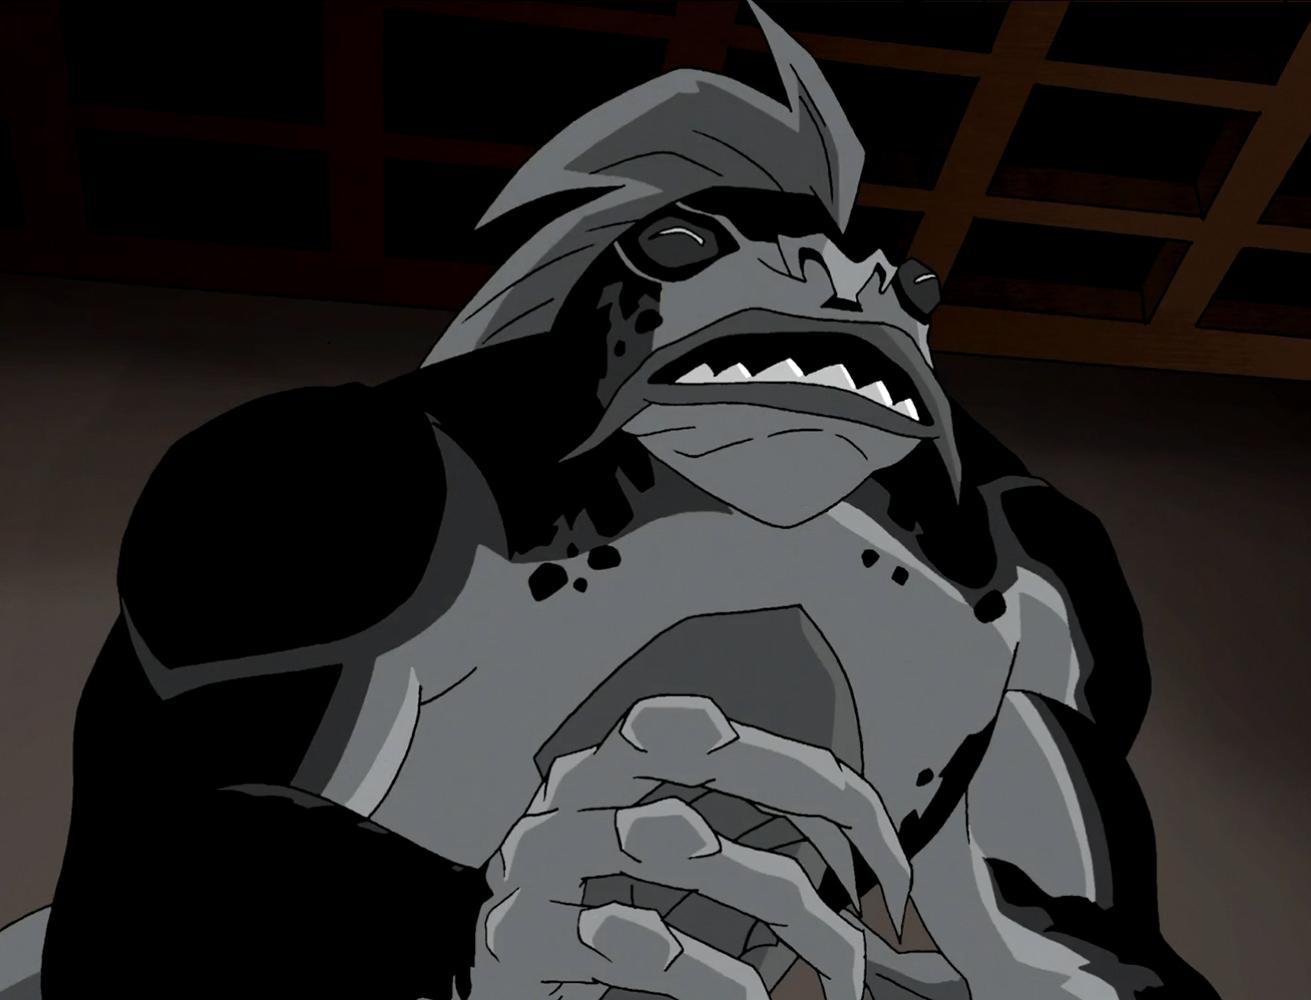 Creature from Jones Lake (Teen Titans TV Series)